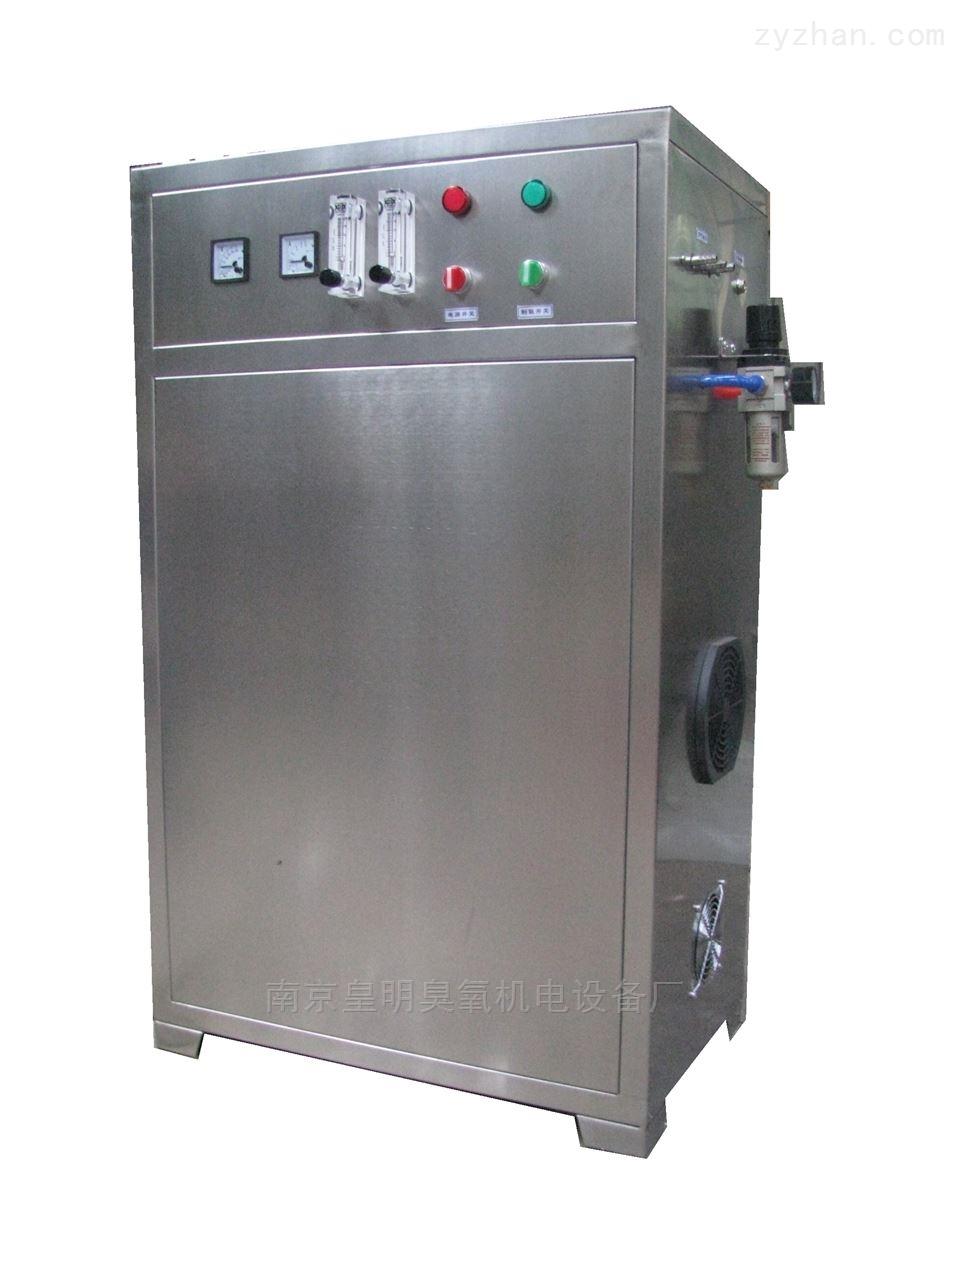 HMS系列一体式臭氧水处理机